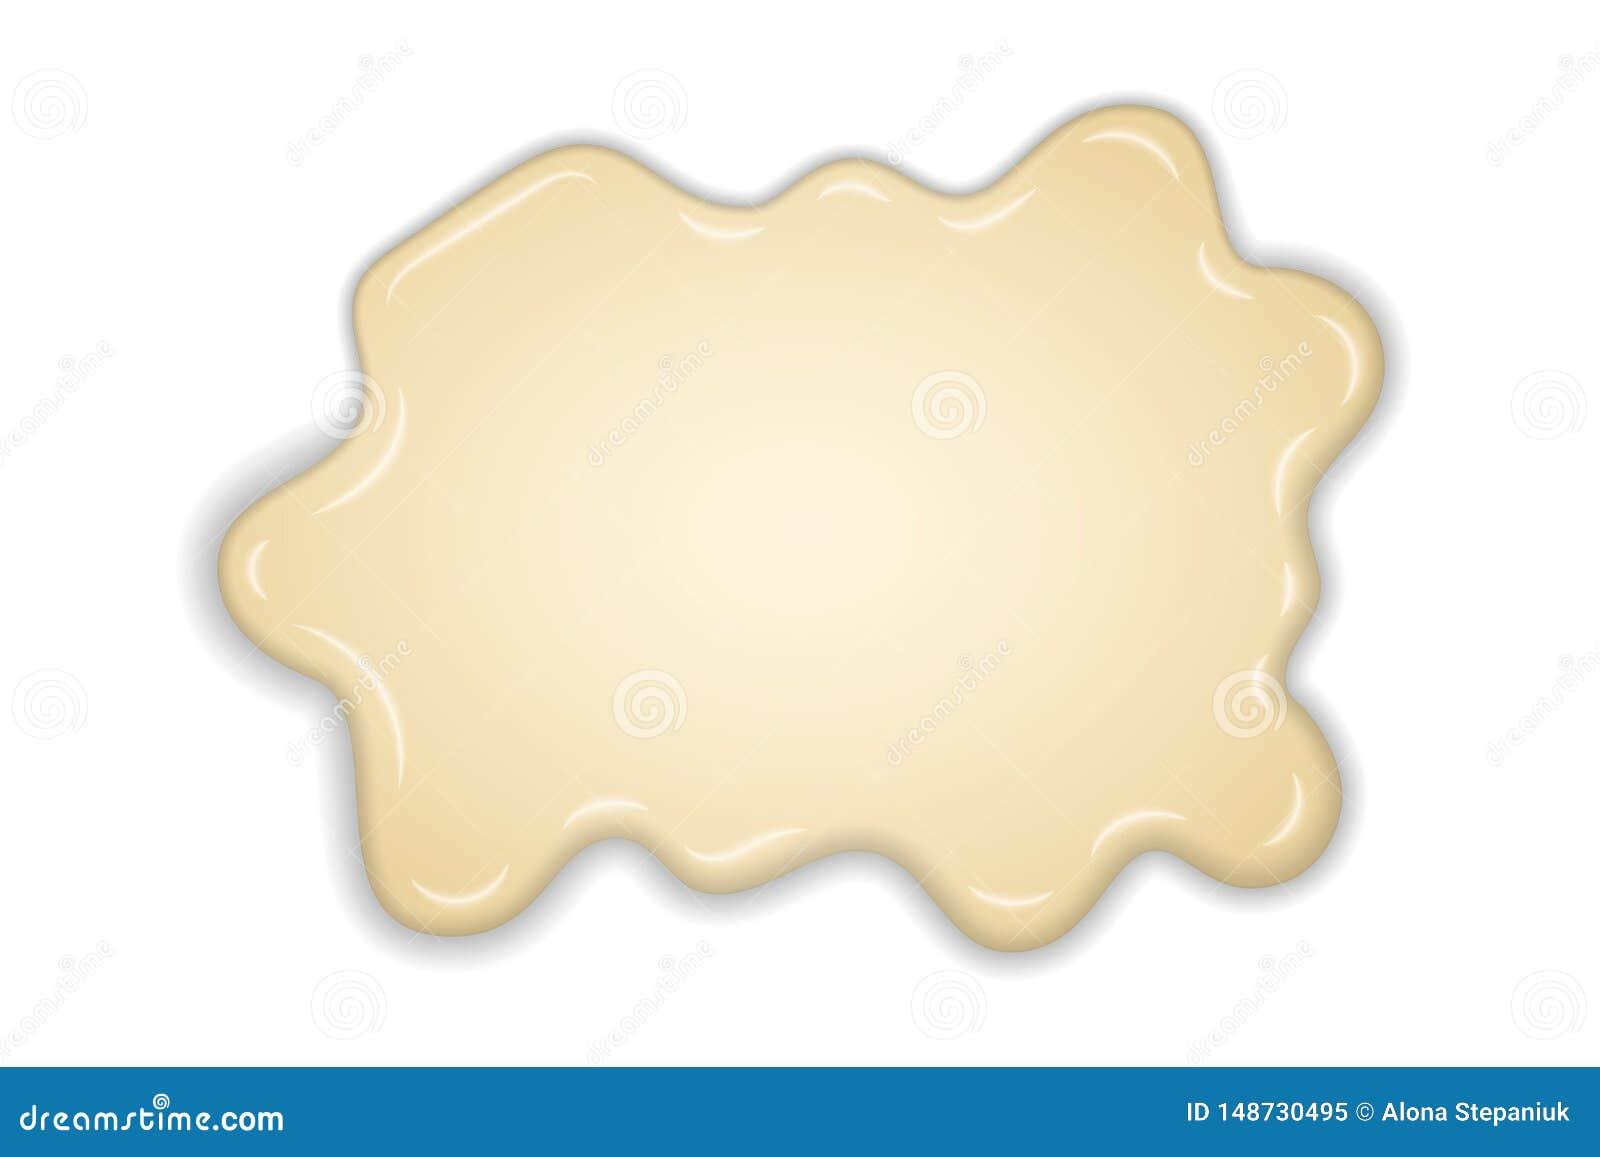 Fondo blanco aislado chocolate cremoso blanco del derretimiento Postre caliente del chocolate con leche de la vainilla Salpique e